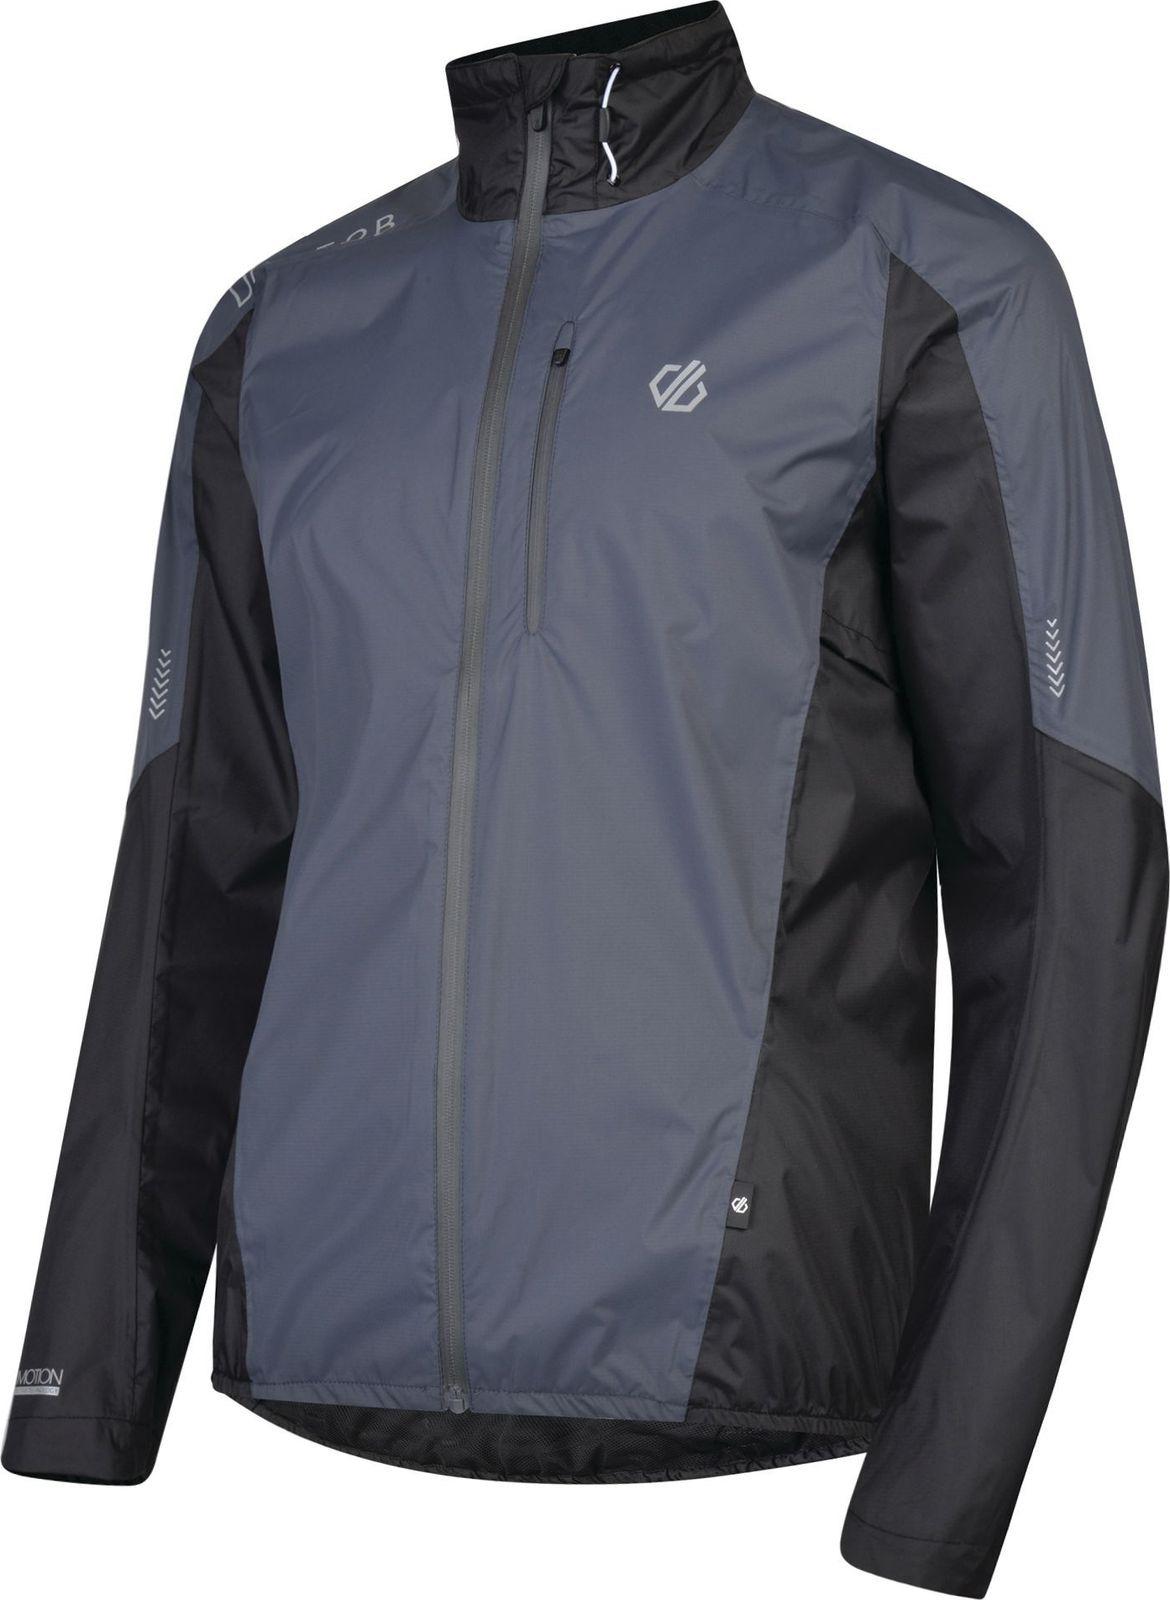 Велокуртка мужская Dare 2b Mediant Jacket, цвет: серый. DMW456-9QV. Размер M (50)